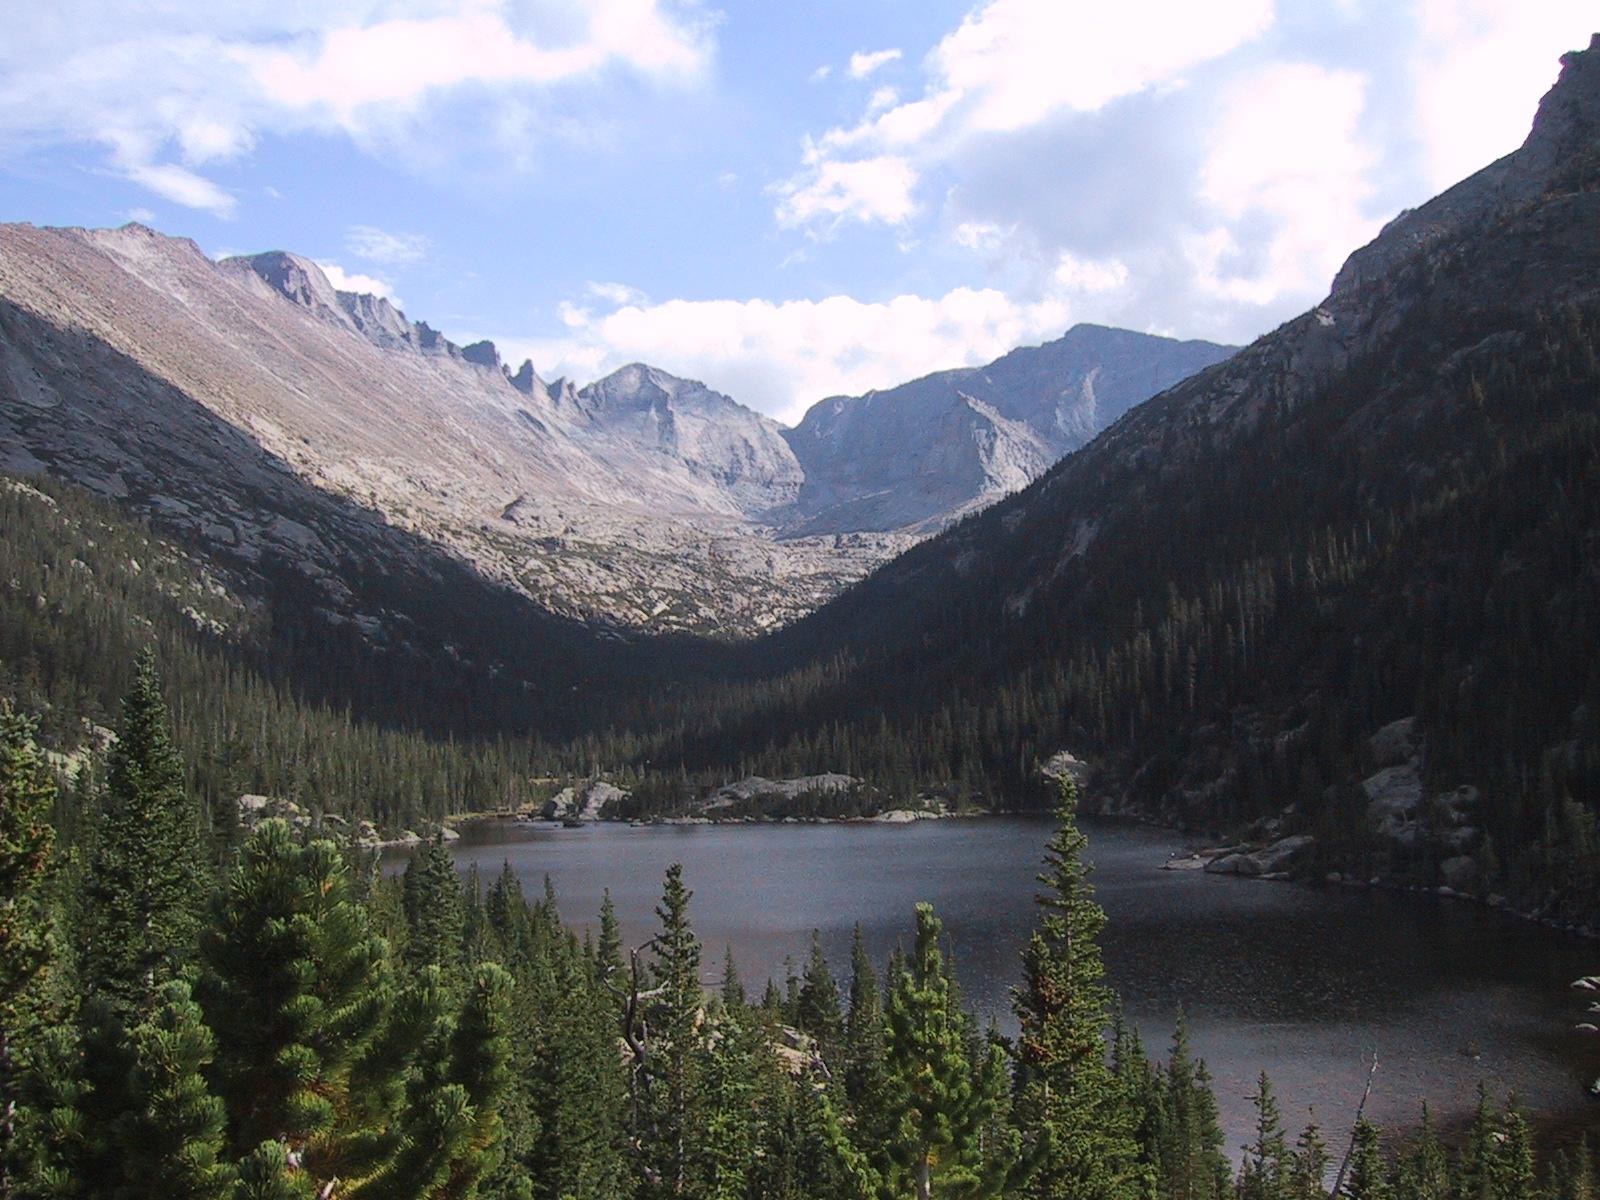 File:Denver-Colorado-The Mountains.jpg - Wikimedia Commons